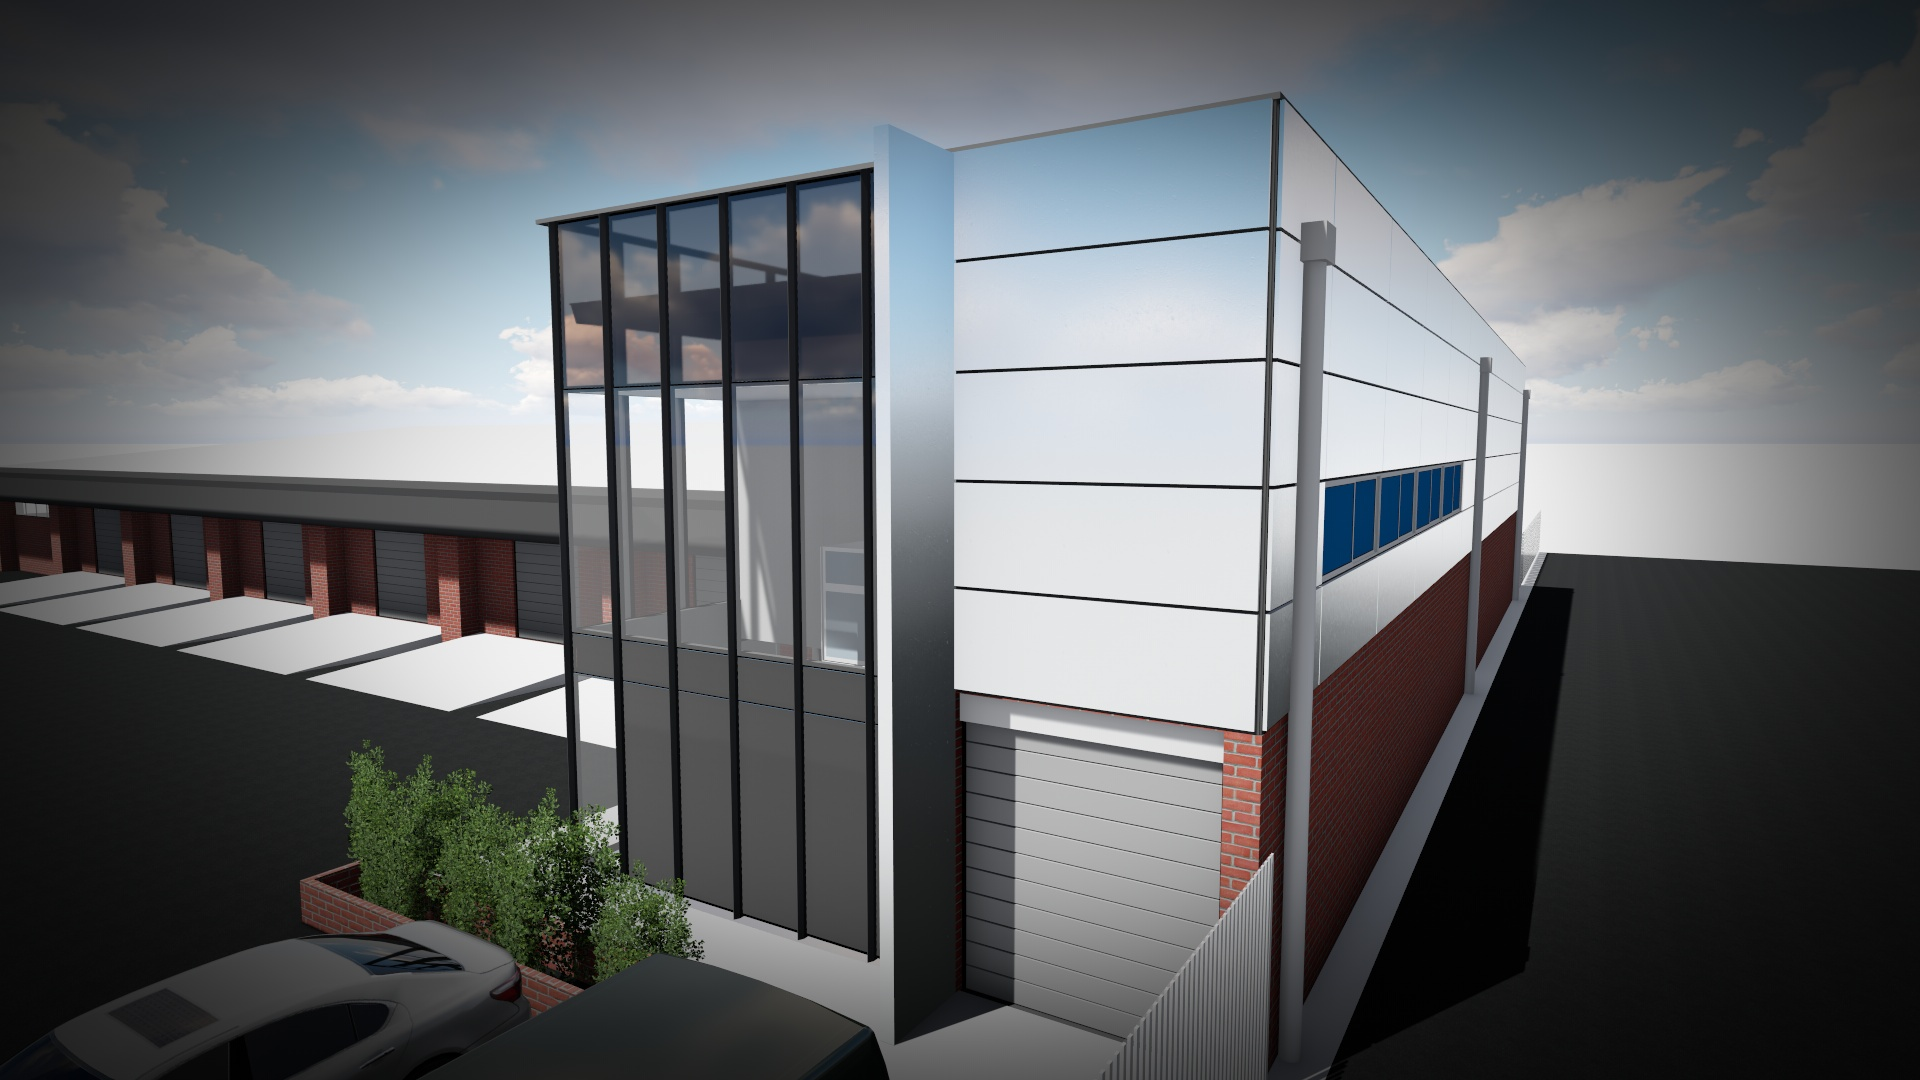 Carter-zub warehouse